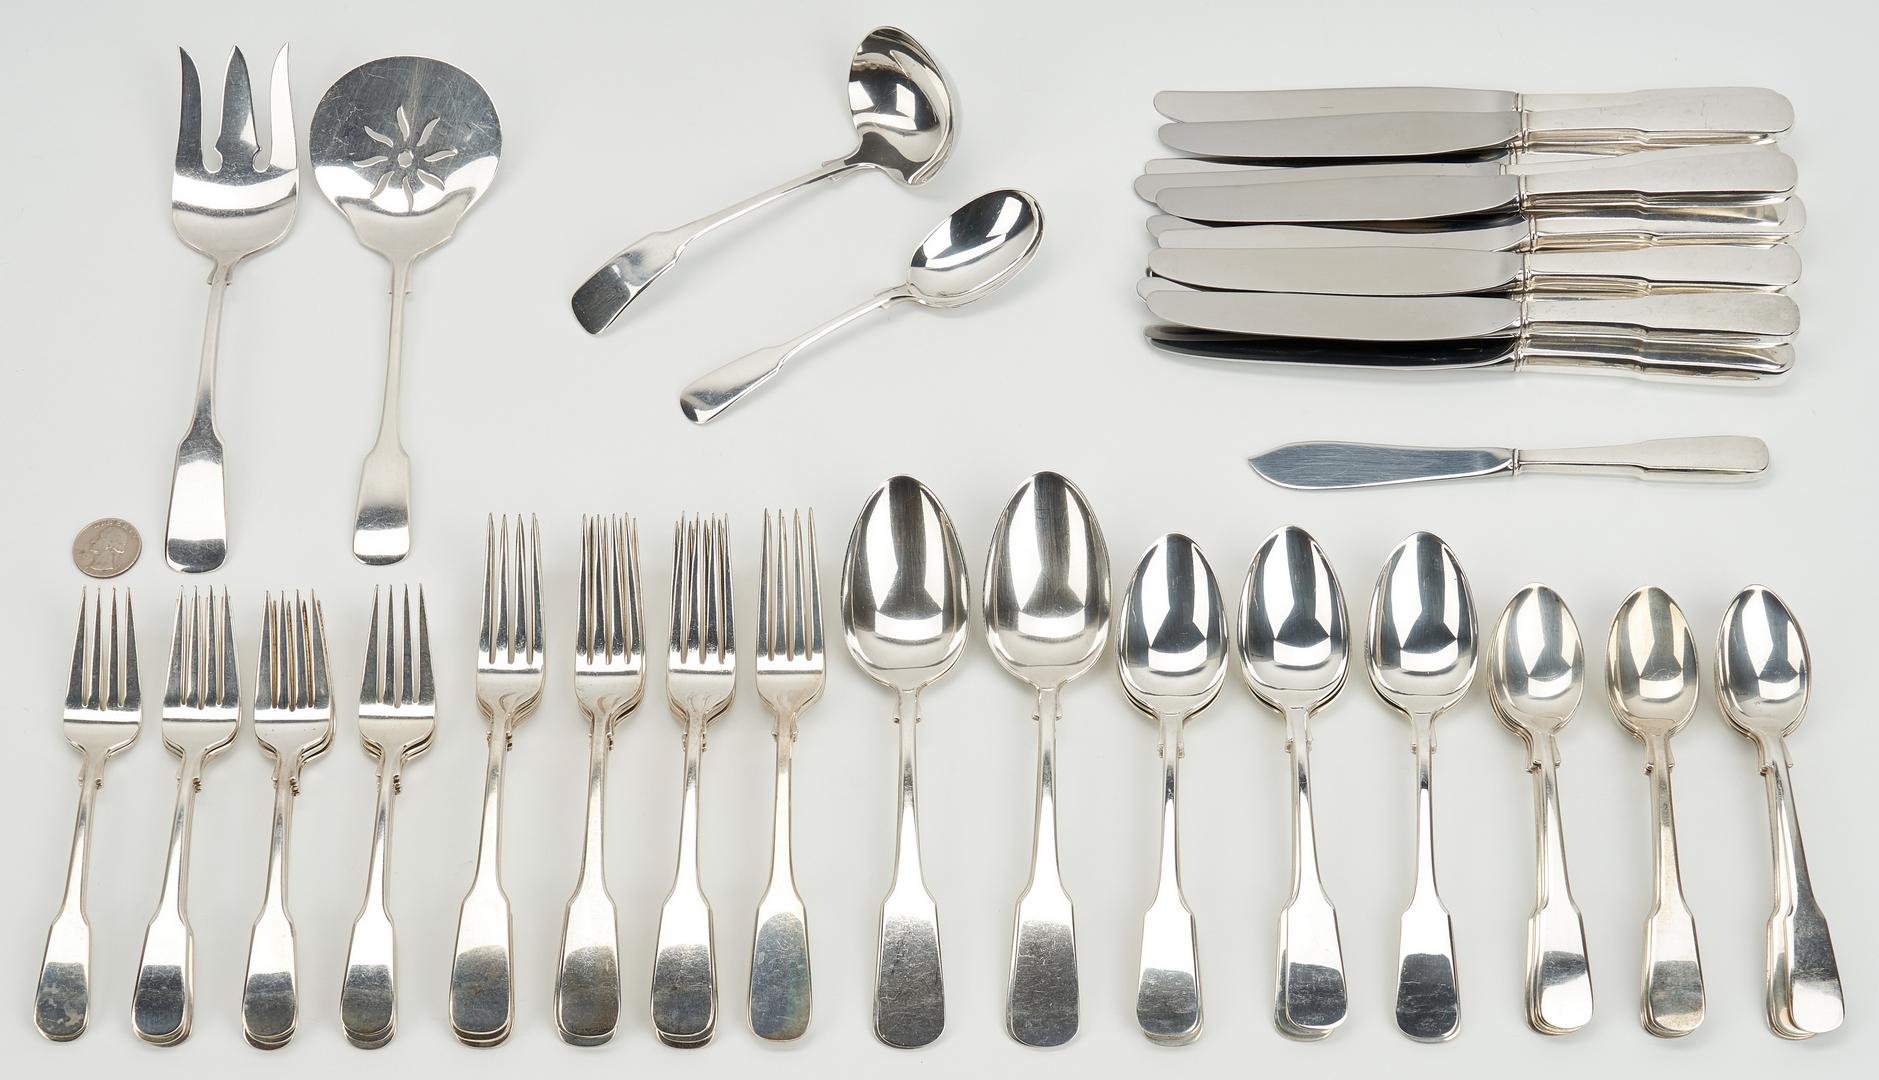 Lot 430: 64 Pcs. International 1810 Sterling Silver Flatware